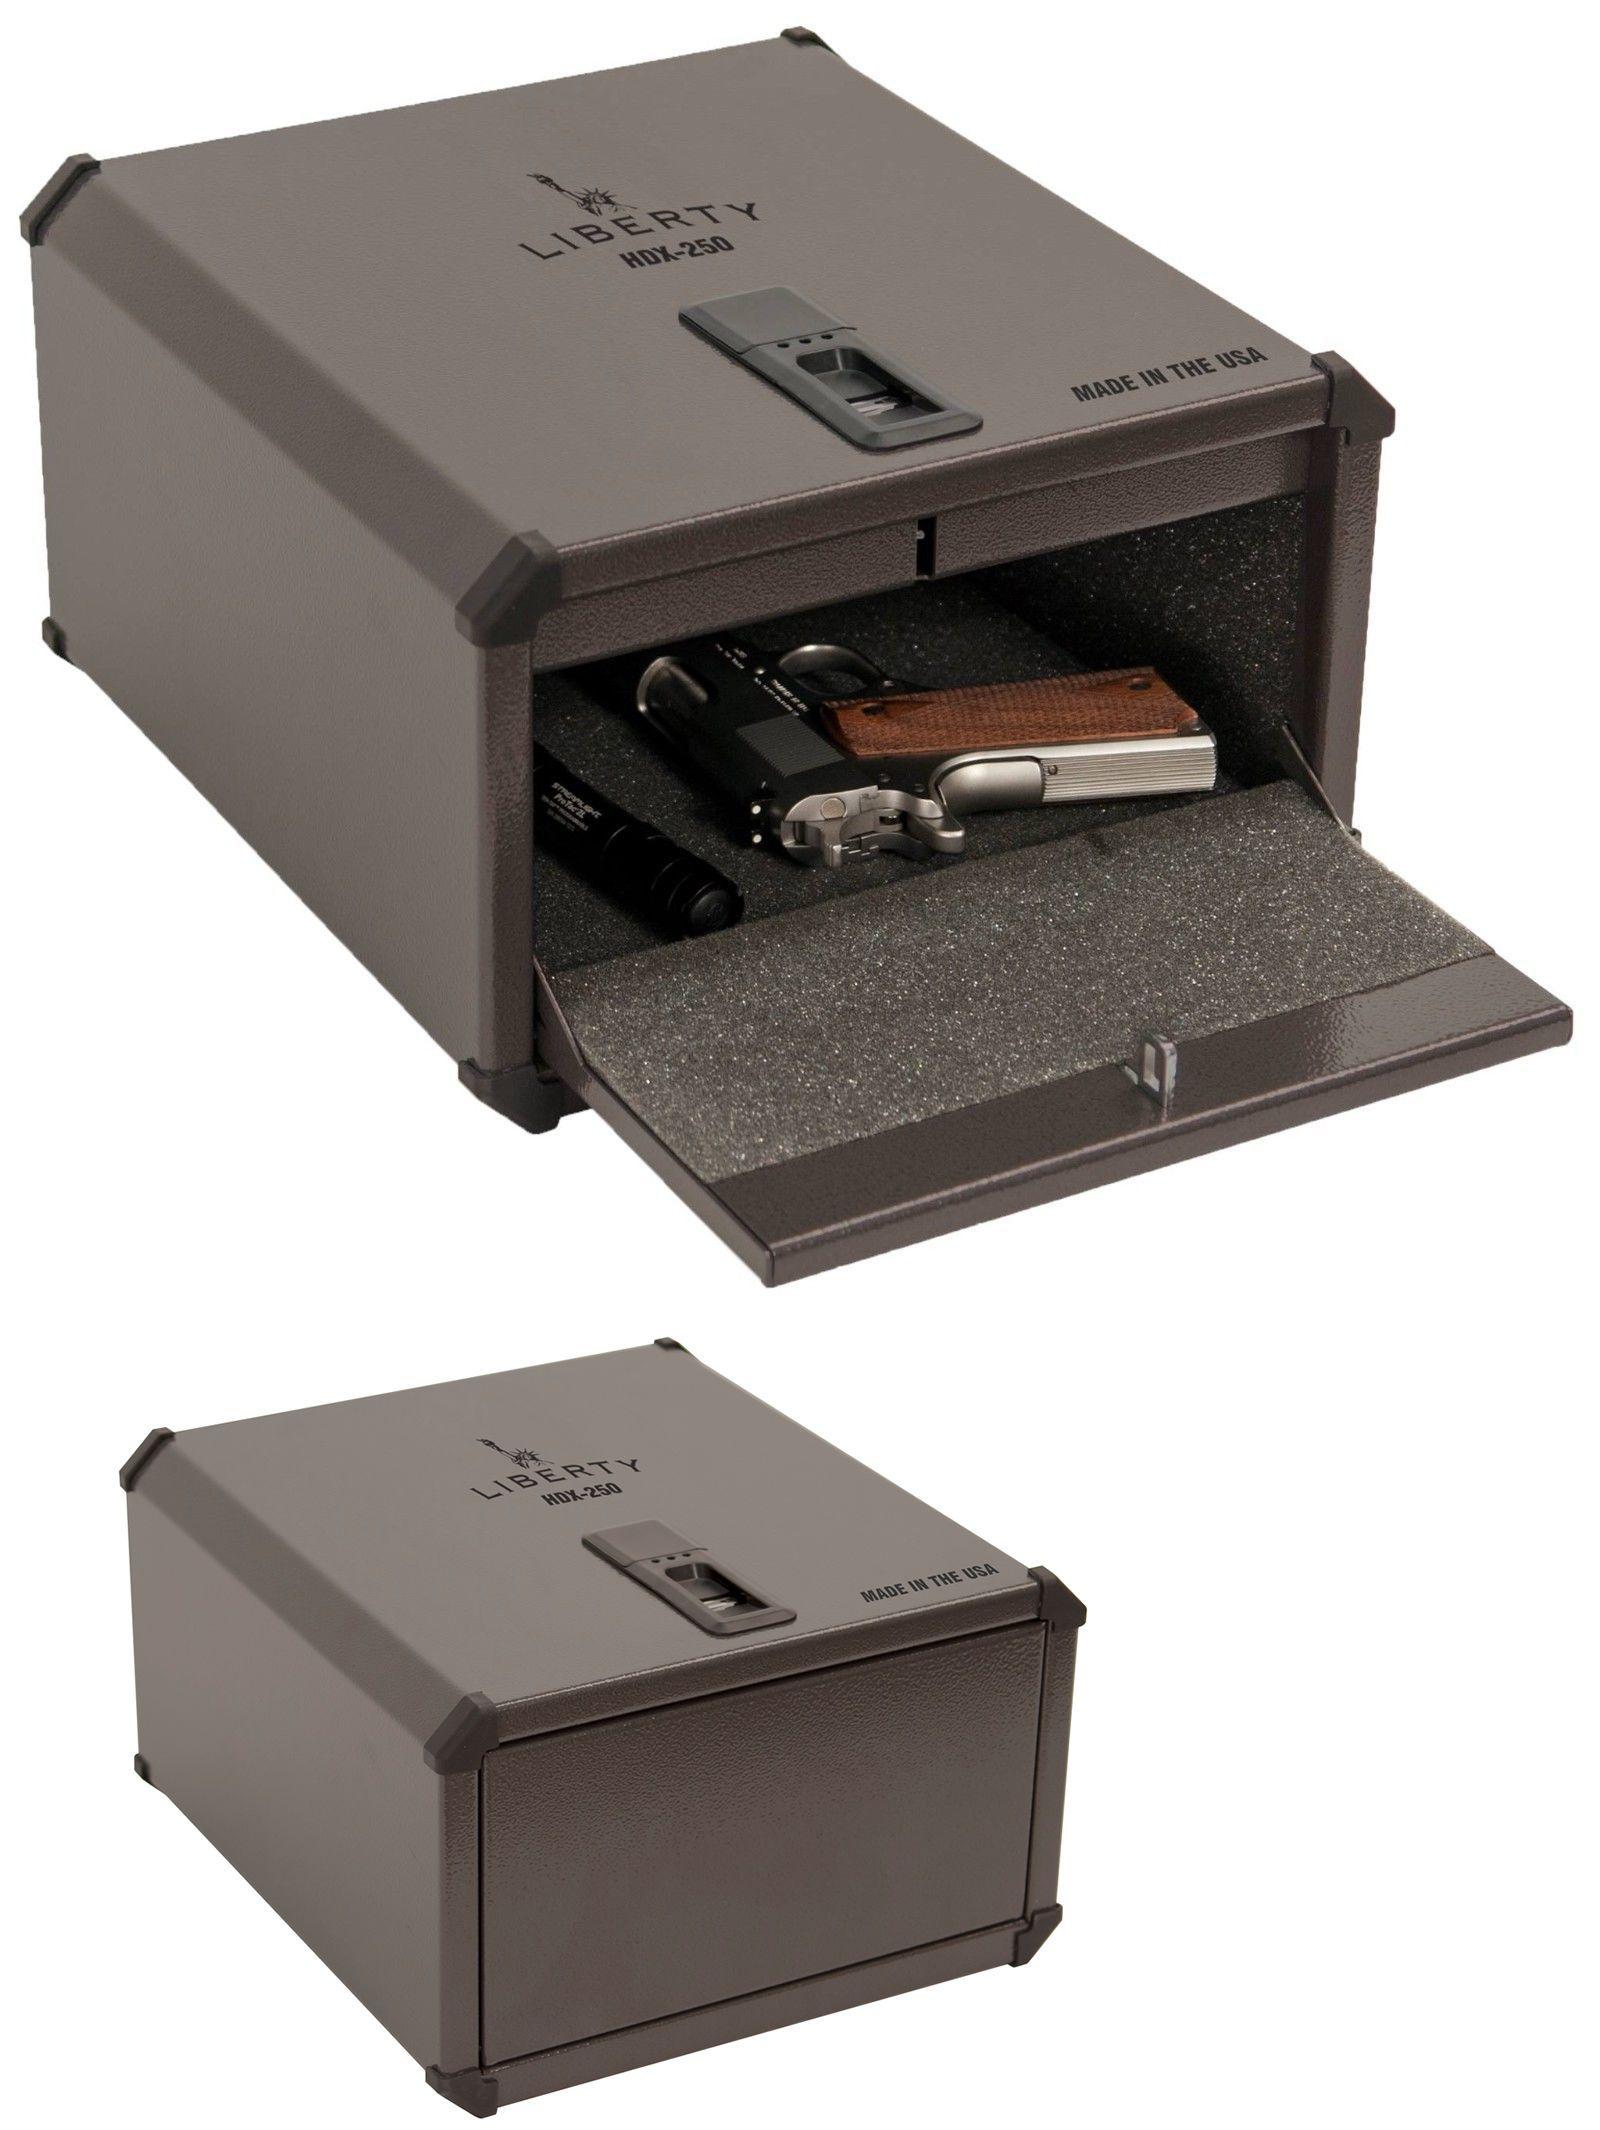 cabinets and safes liberty smartvault biometric handgun pistol safe fingerprint gun box hdx - Biometric Safe